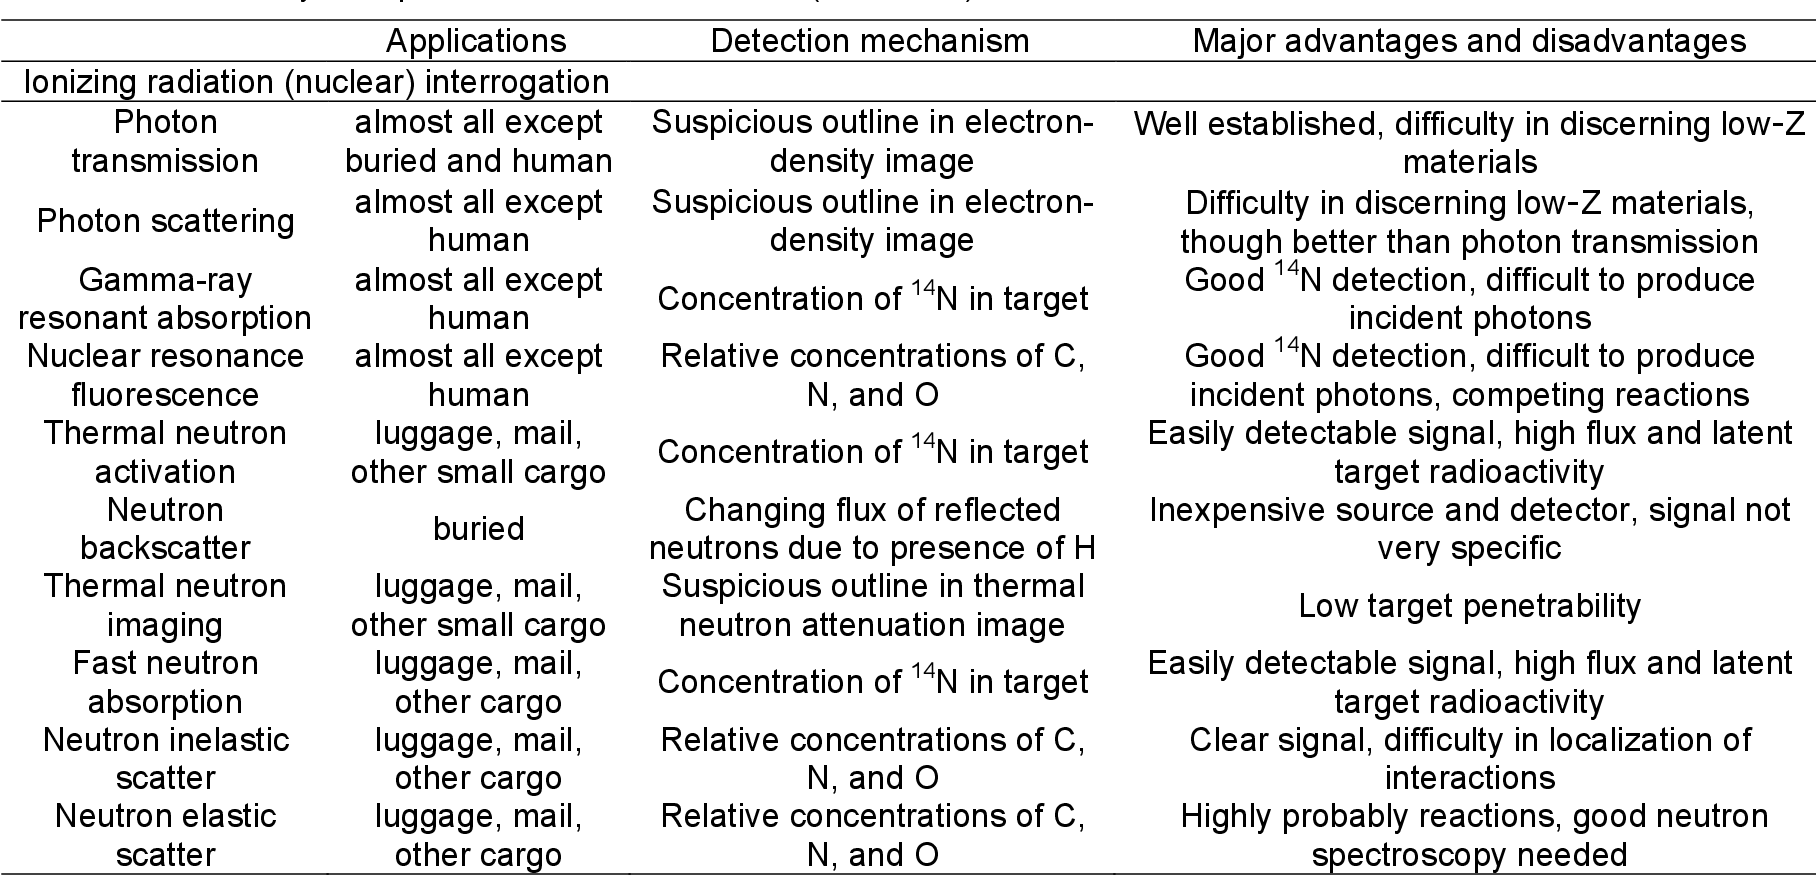 A Flag-Based Algorithm for Explosives Detection in Sea-Land Cargo